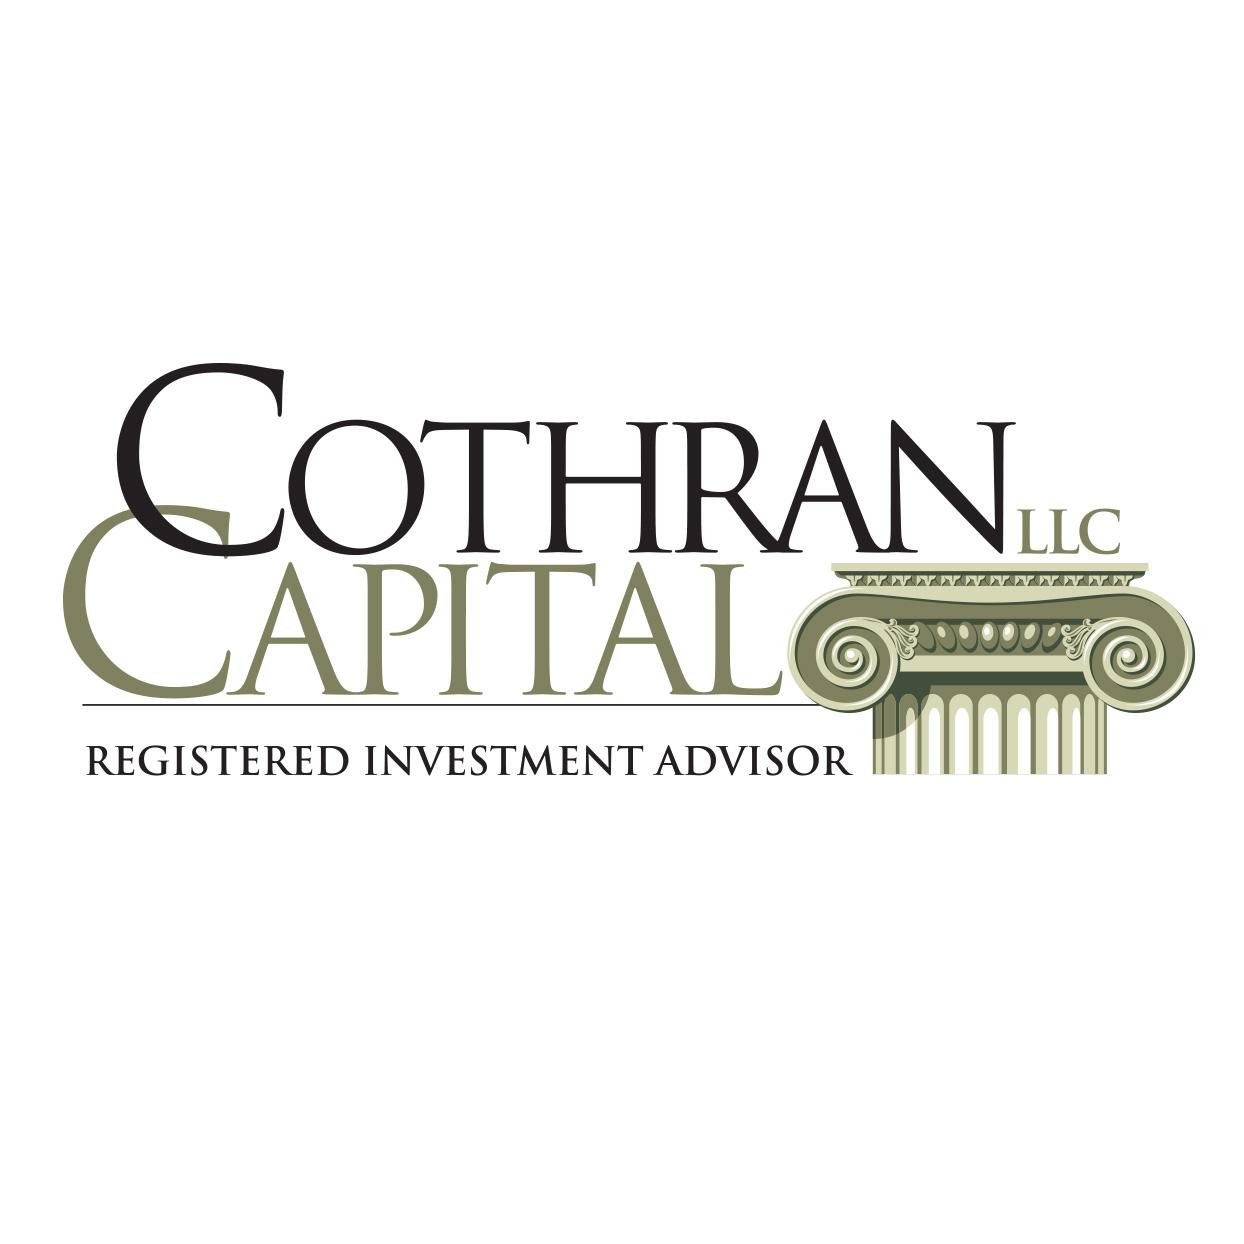 Cothran Capital.jpg